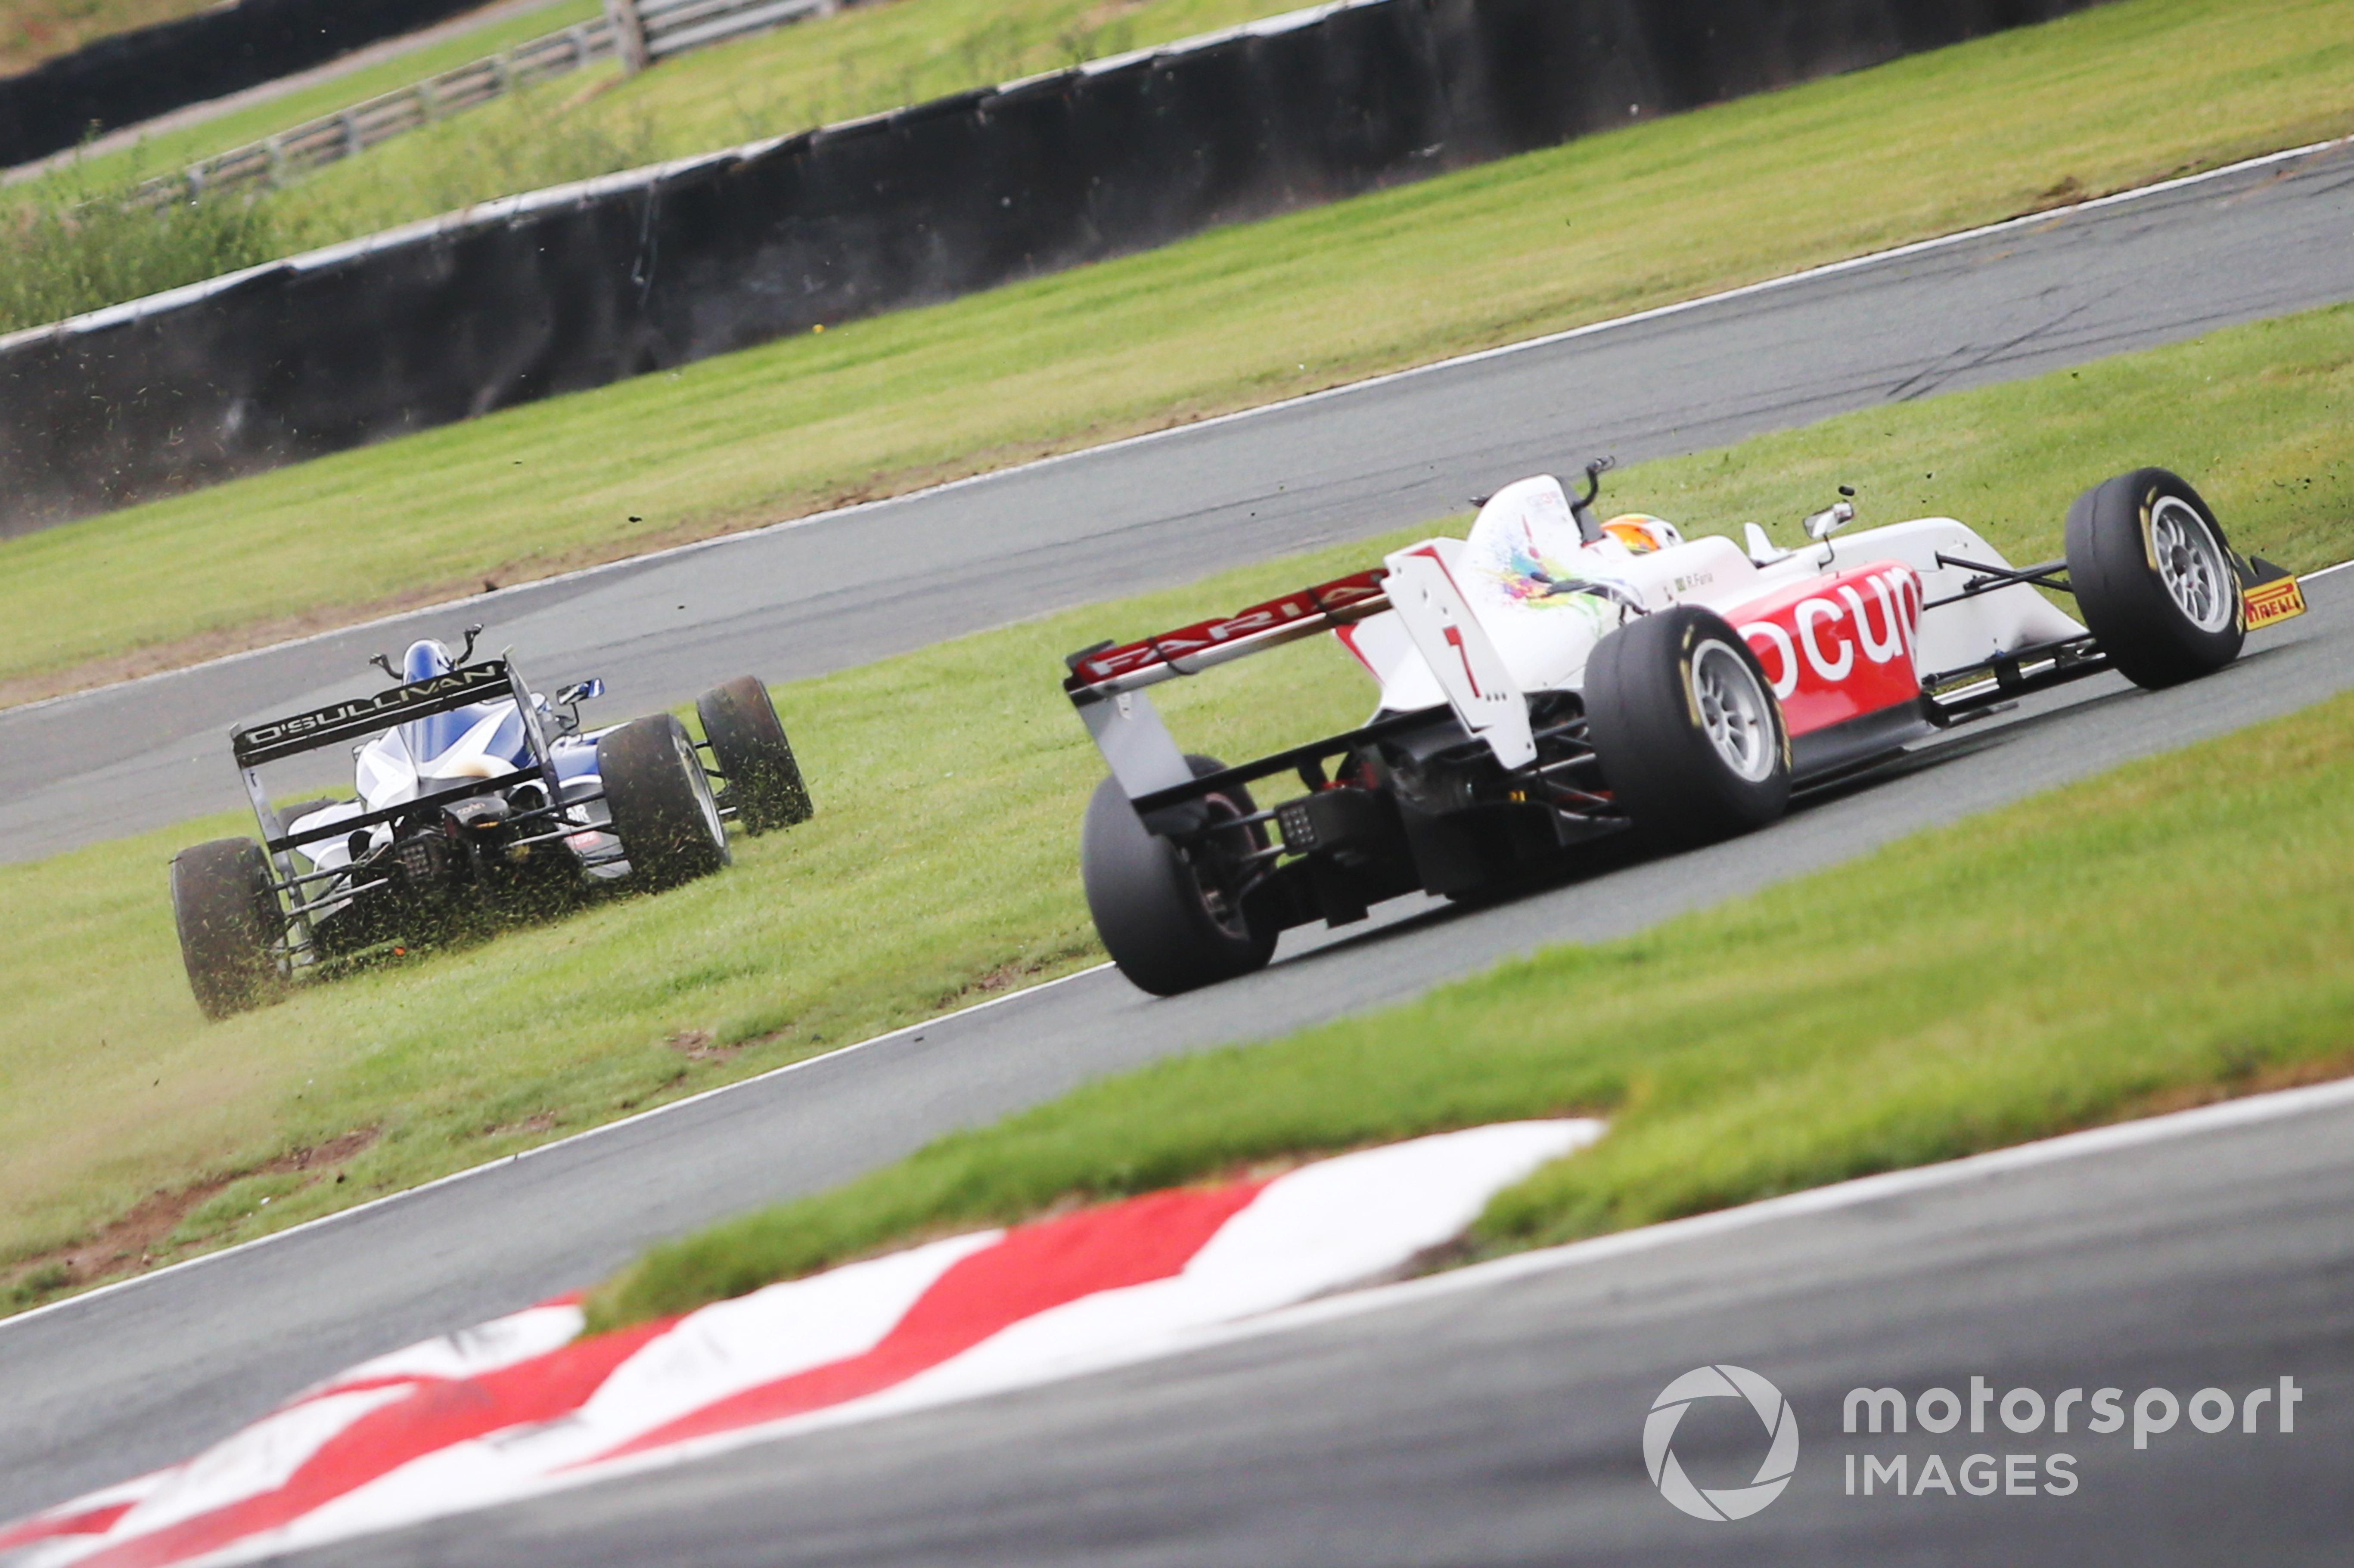 Zak O'Sullivan heads off the track, GB3, Oulton Park 2021